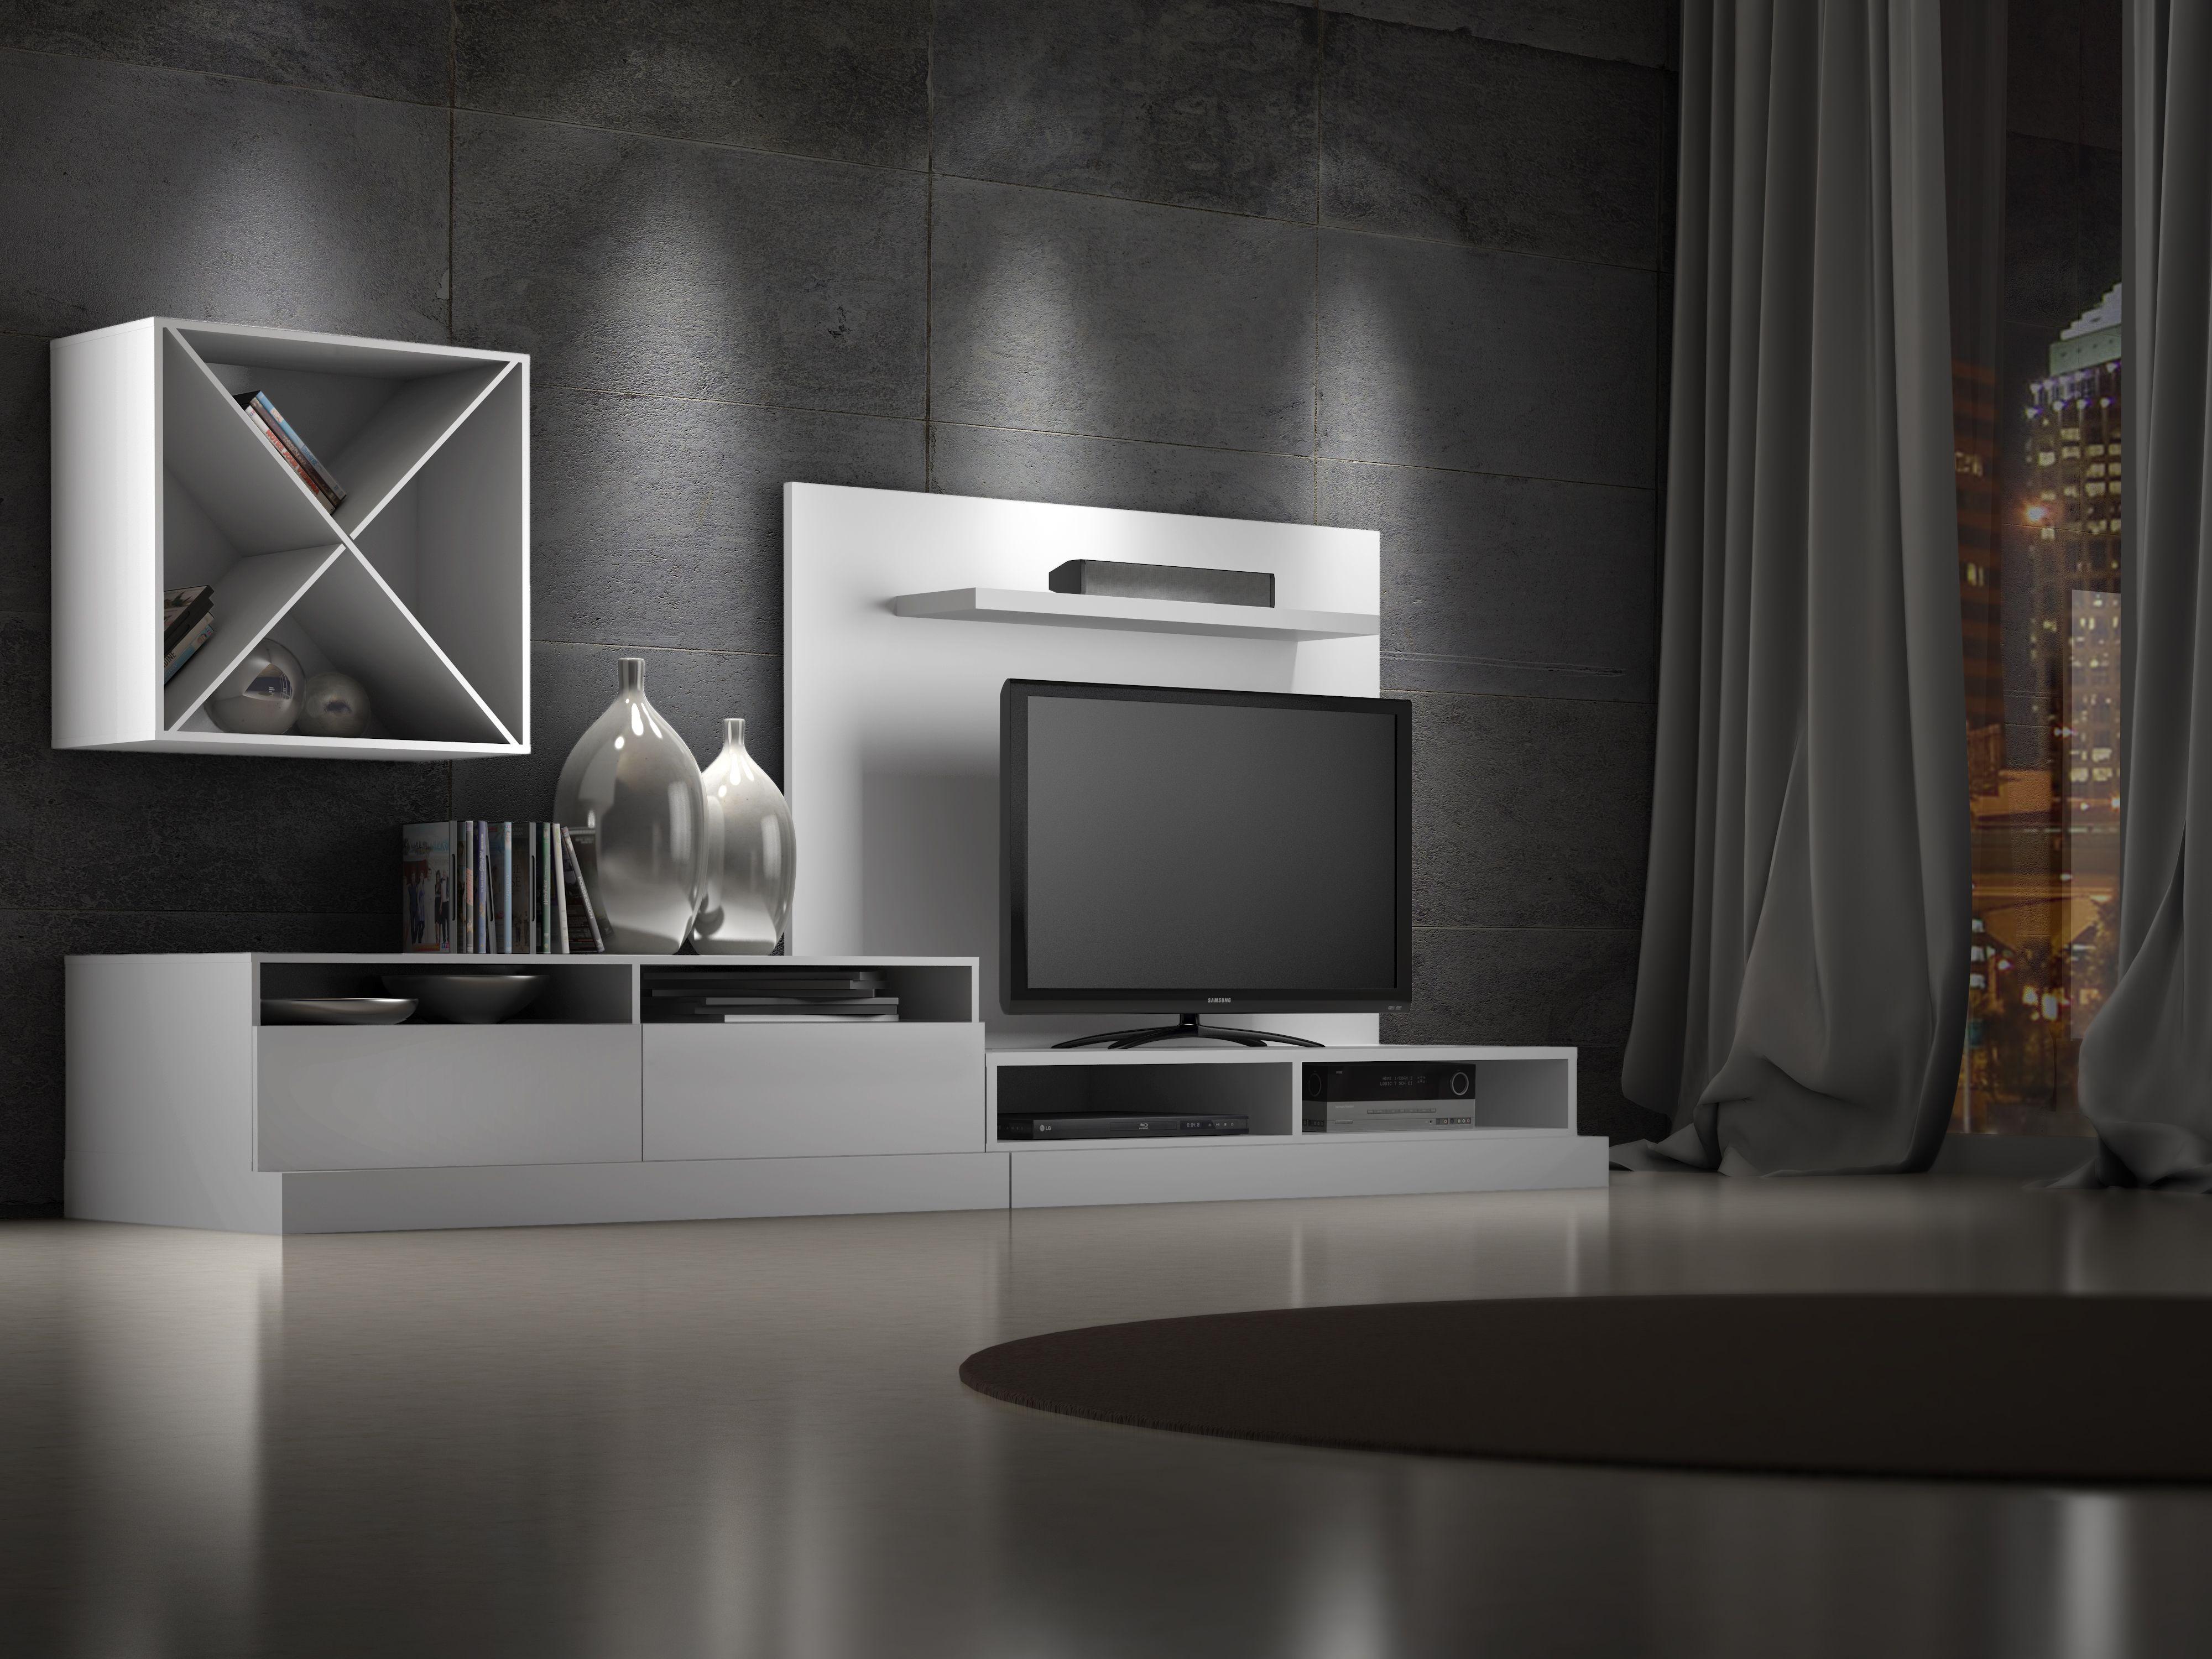 Syne Createch Design Elegant Modern Design Mediastorage  # Deco Table Tele Plus Homecimema